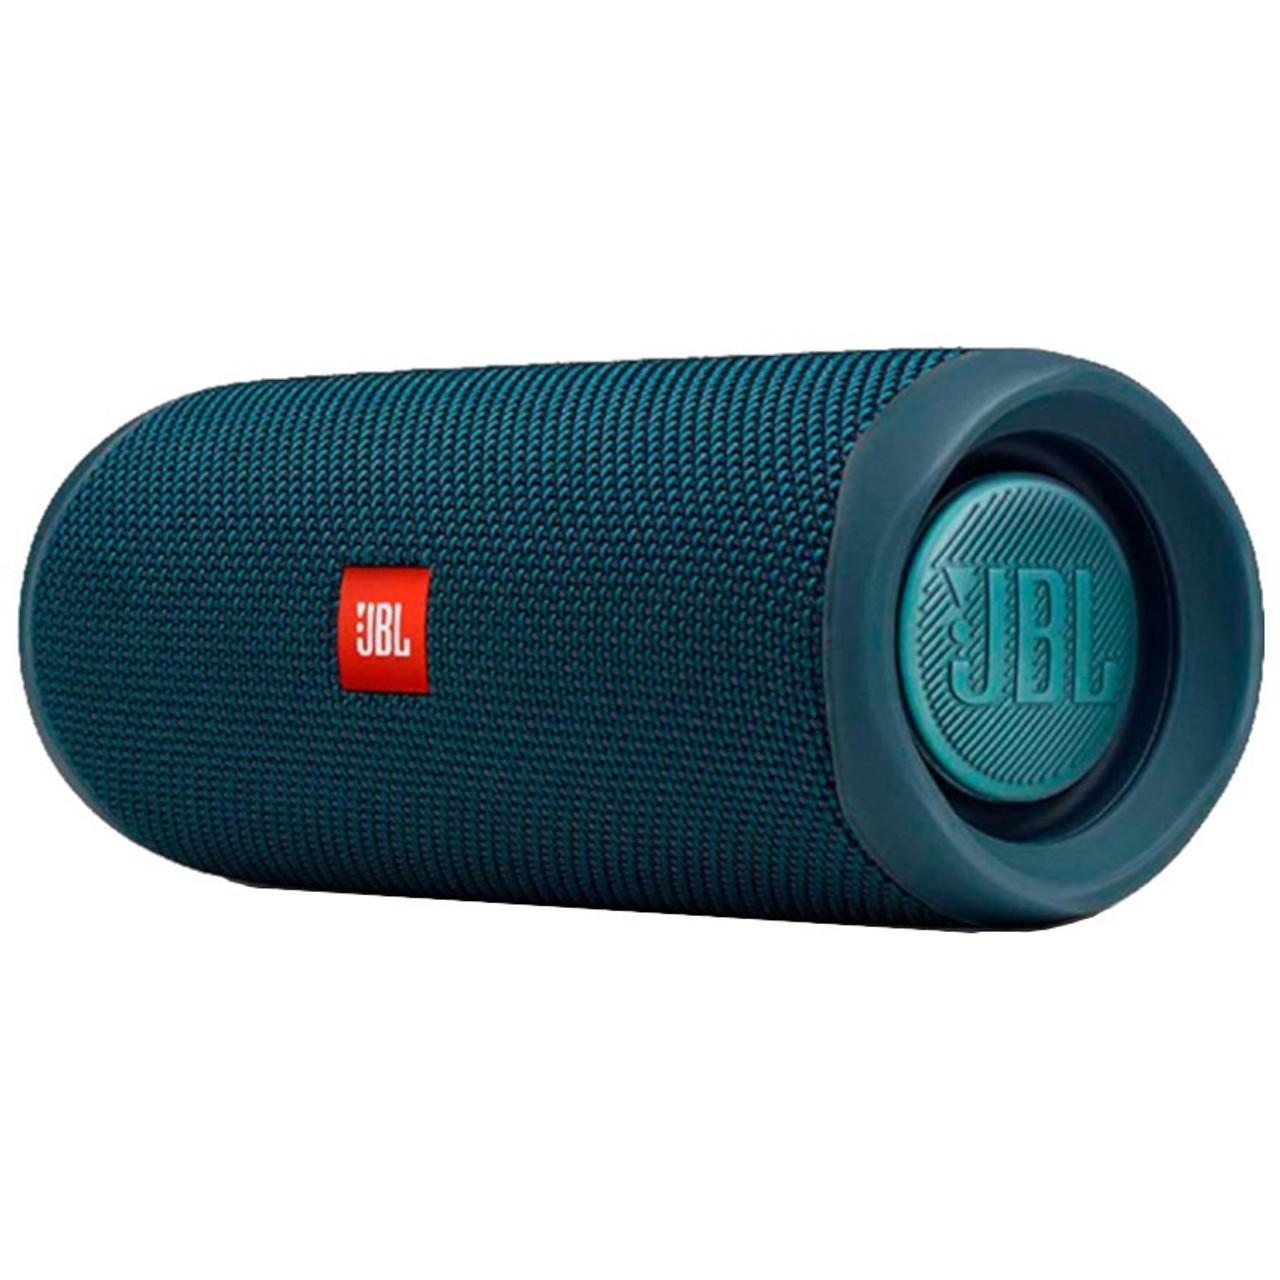 JBL JBLFLIP5BLUAM-Z FLIP 5 Portable Speaker Waterproof - Blue - Certified Refurbished